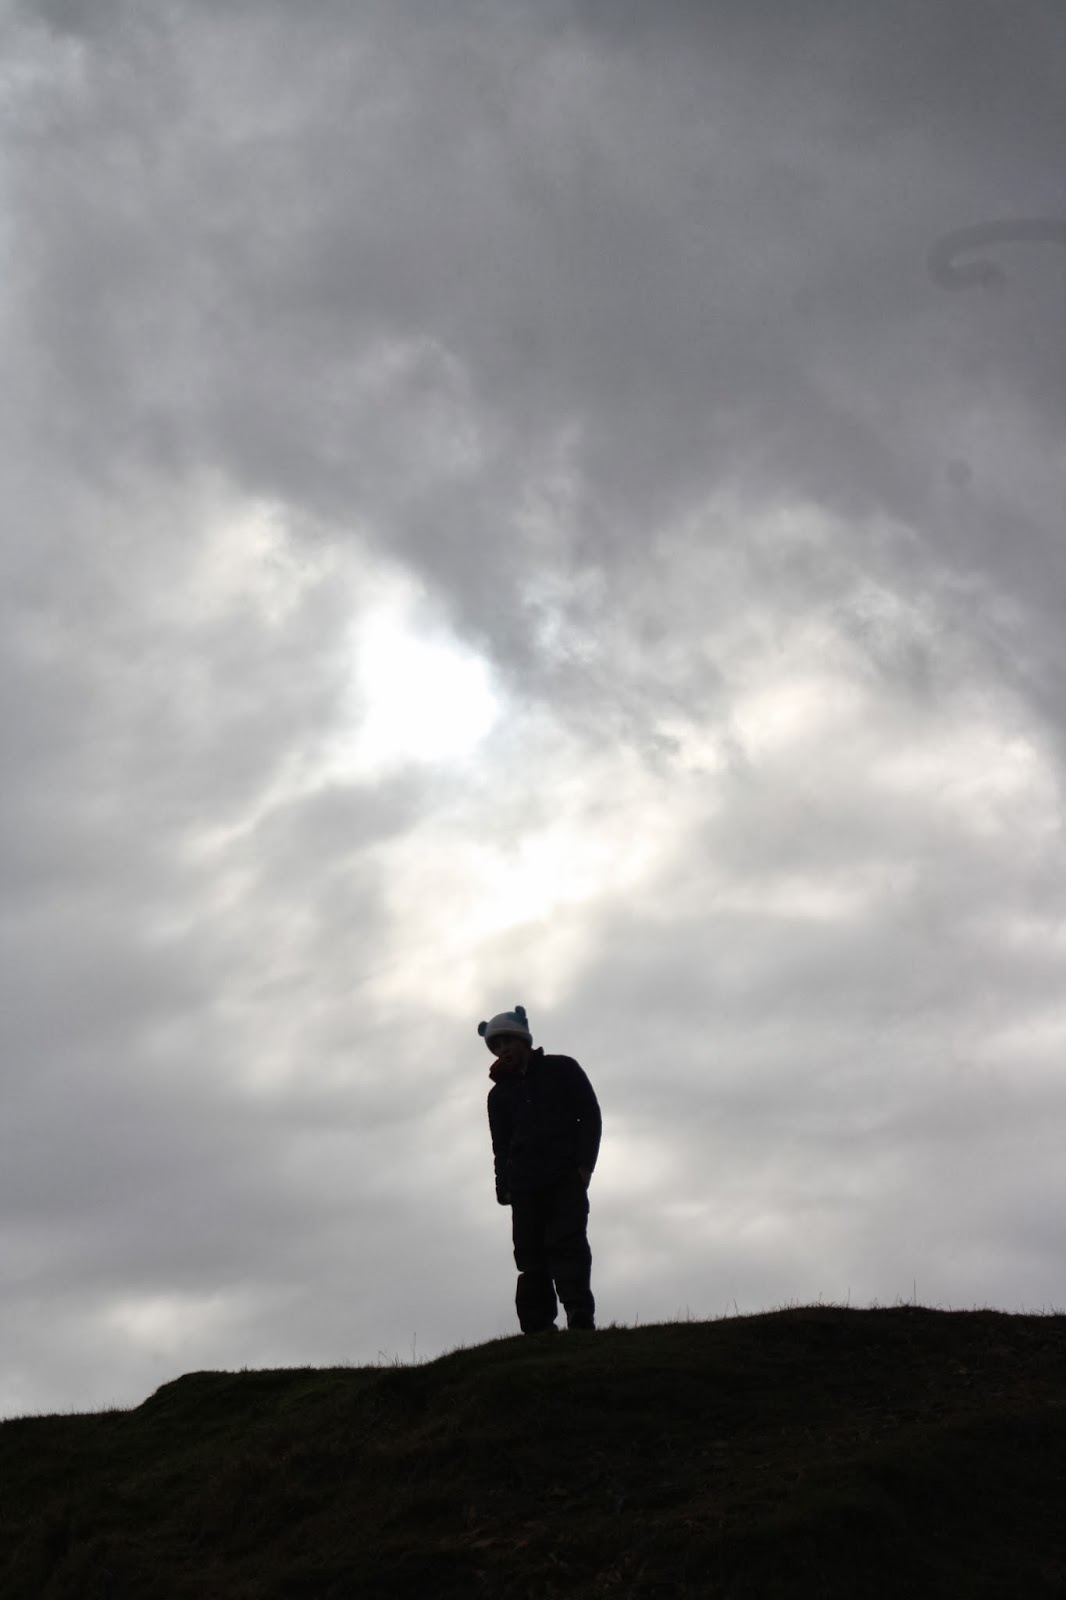 Silent-Sunday-son-sky-stormy